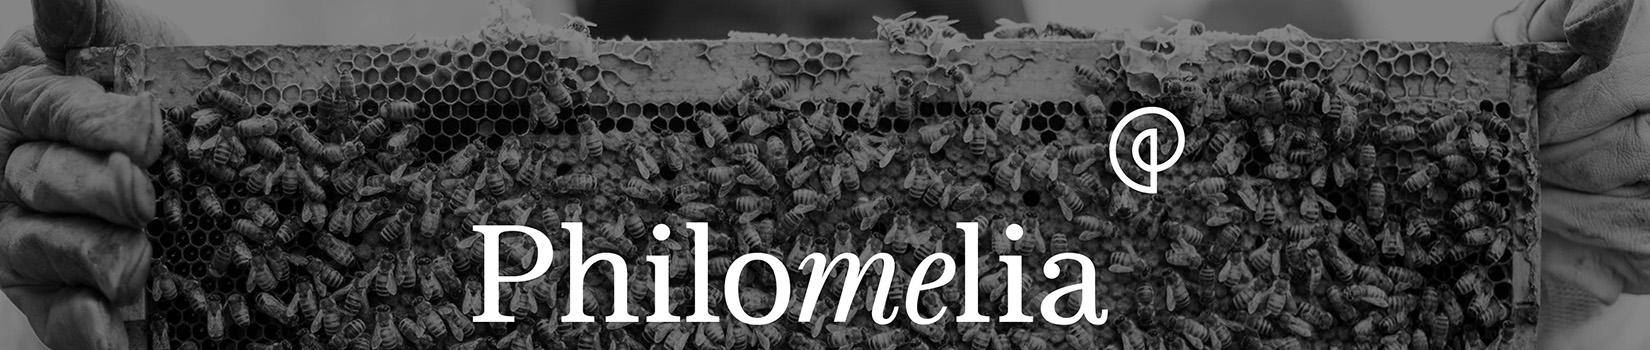 Philomelia Greek Honey